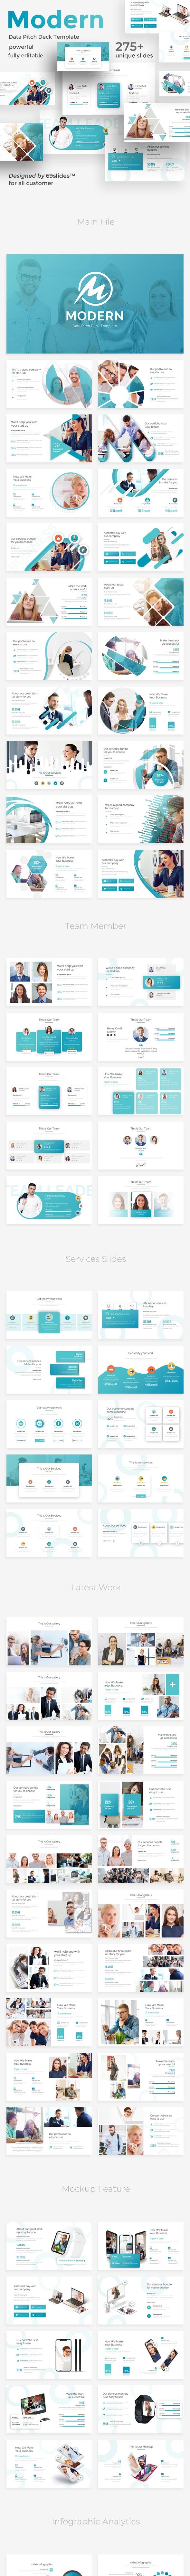 Modern Data Pitch Deck Google Slide Template - Google Slides Presentation Templates